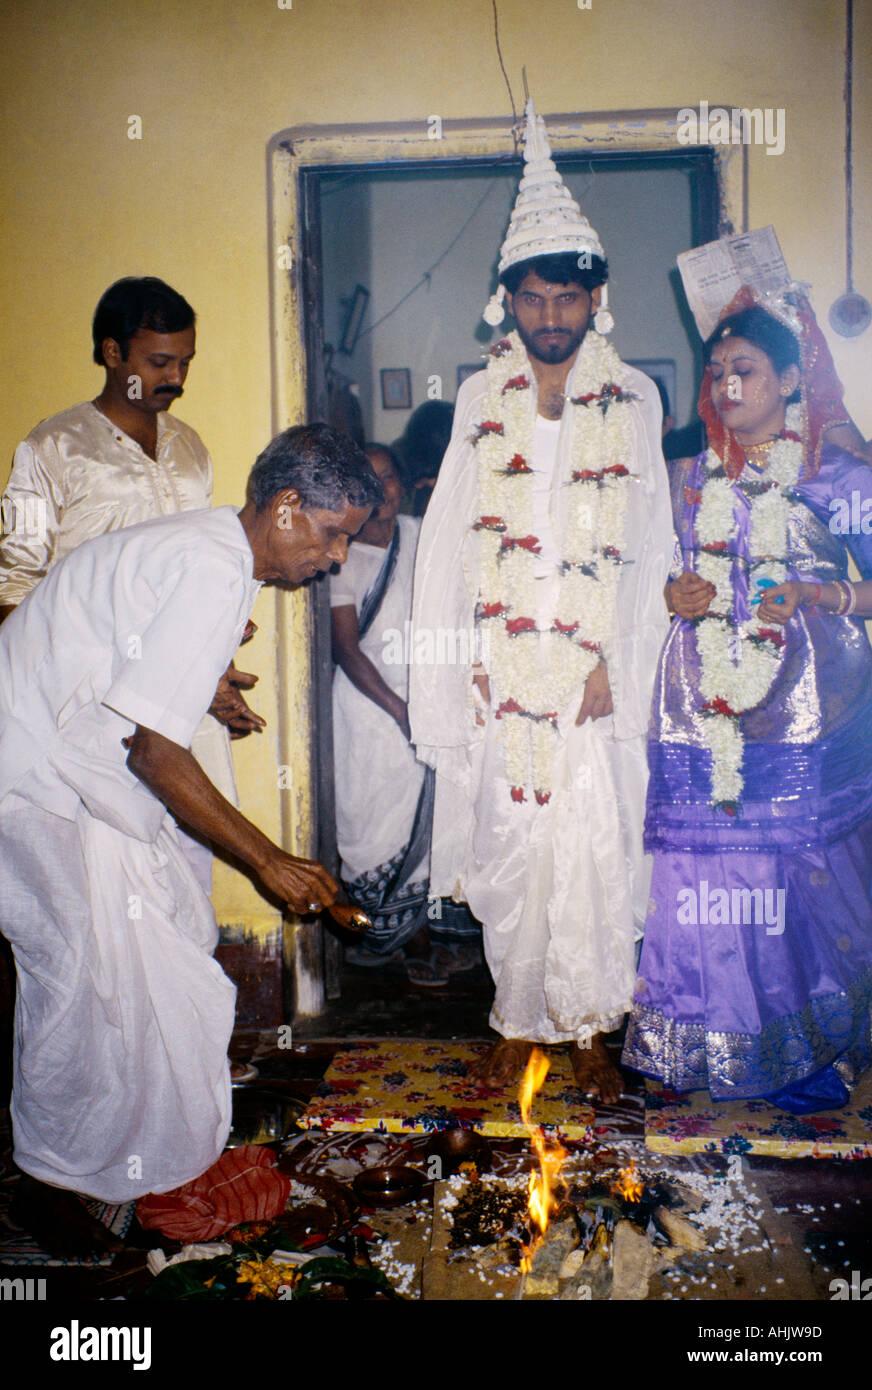 39084151b0377 Calcutta India Hindu Wedding Bride Groom Walking Round Fire Stock ...